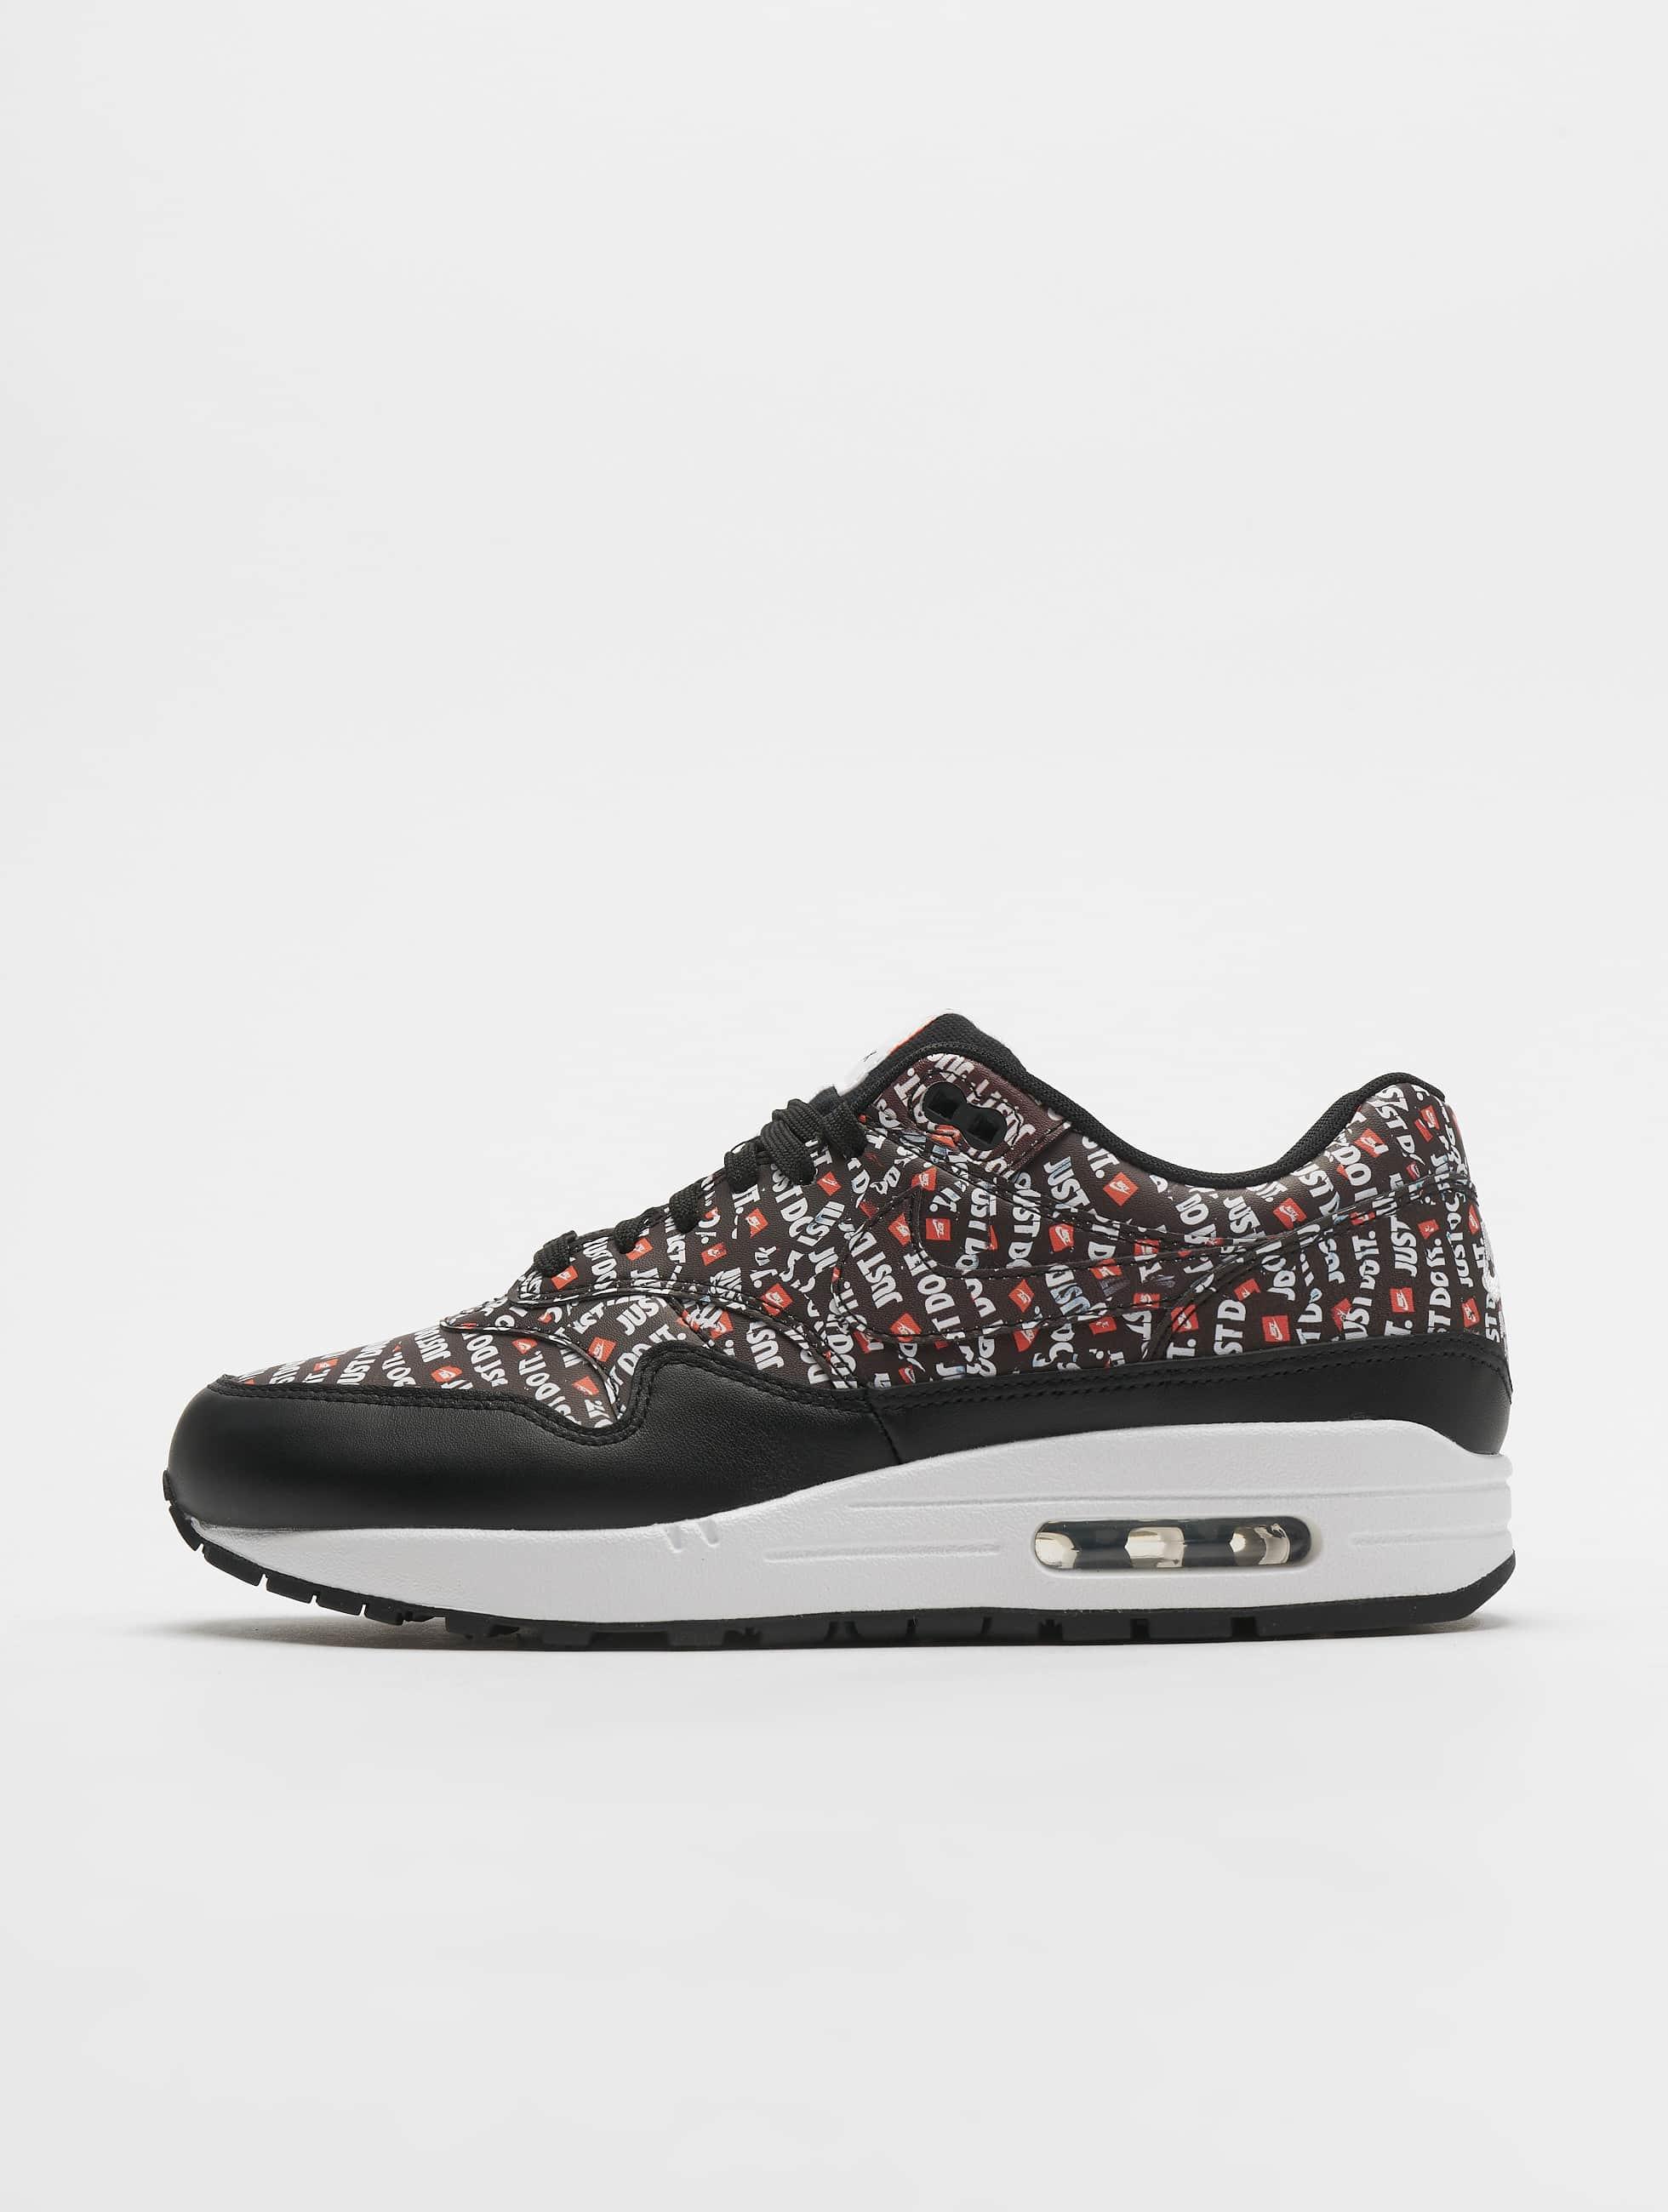 buy online a563d 110a2 Nike Skor   Sneakers Mike Air Max 1 Premium i svart 498863